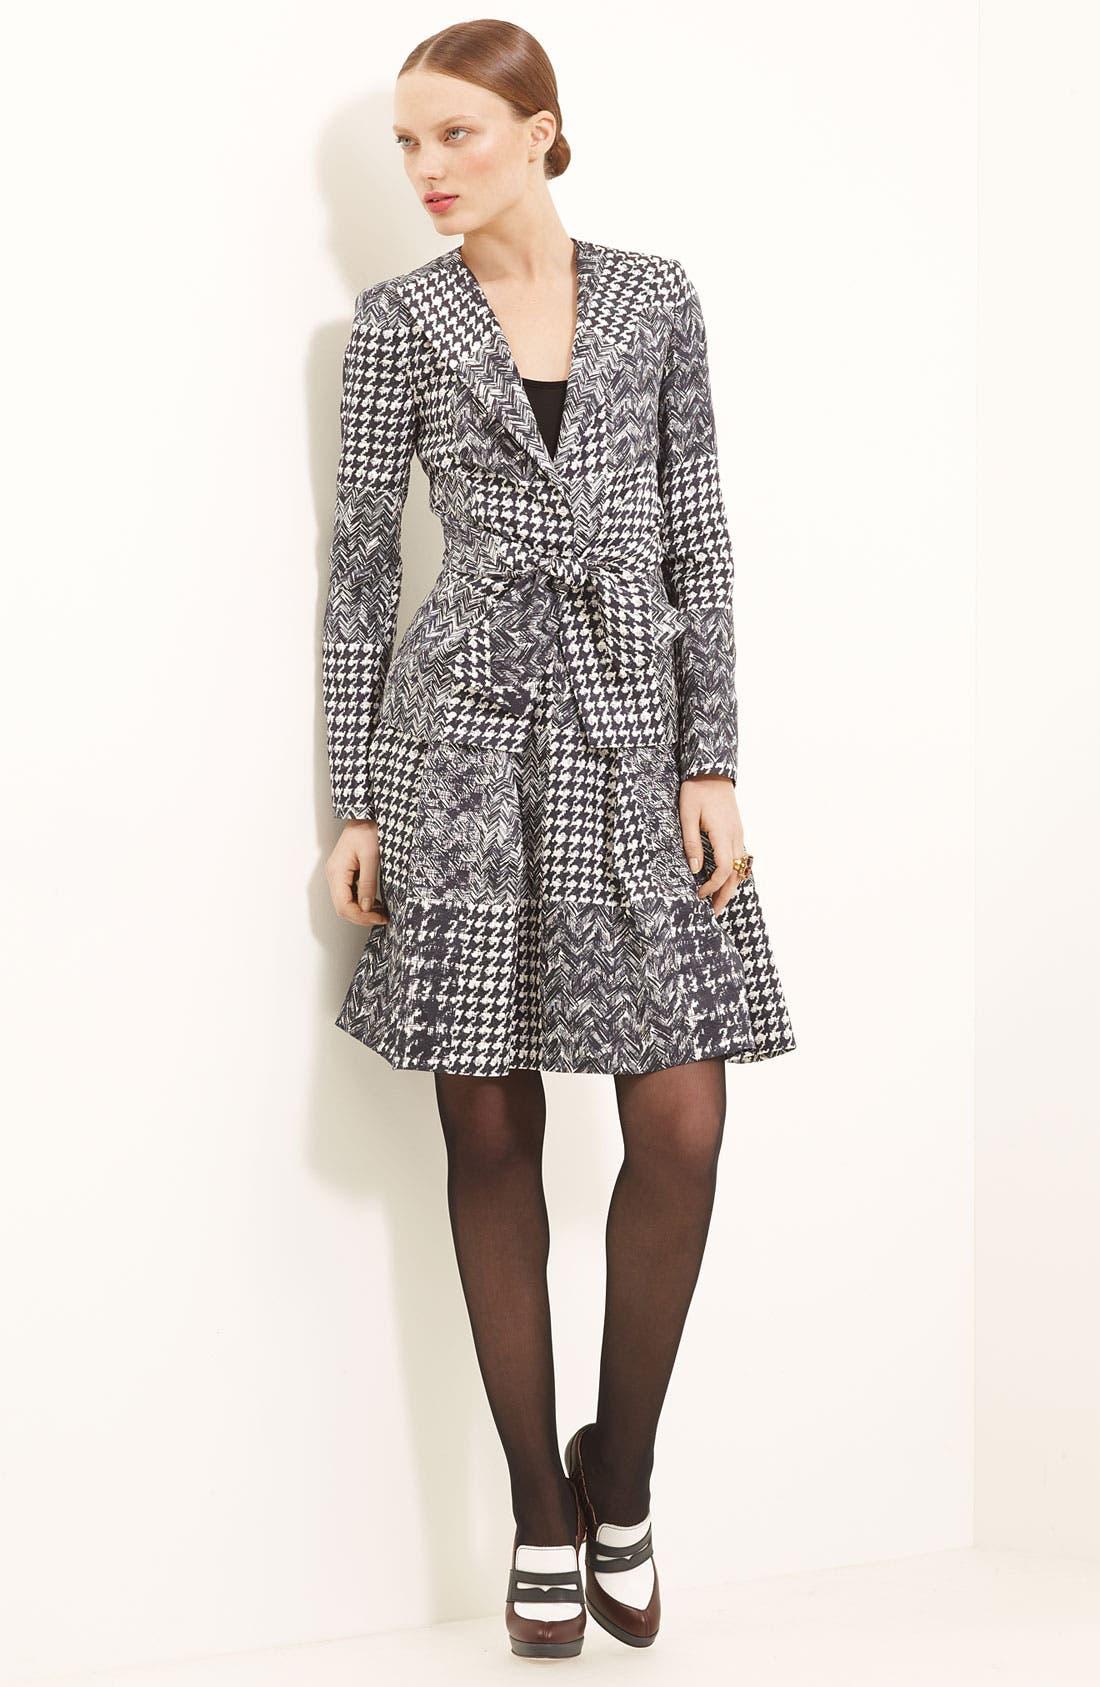 Main Image - Oscar de la Renta Patchwork Jacket & Skirt